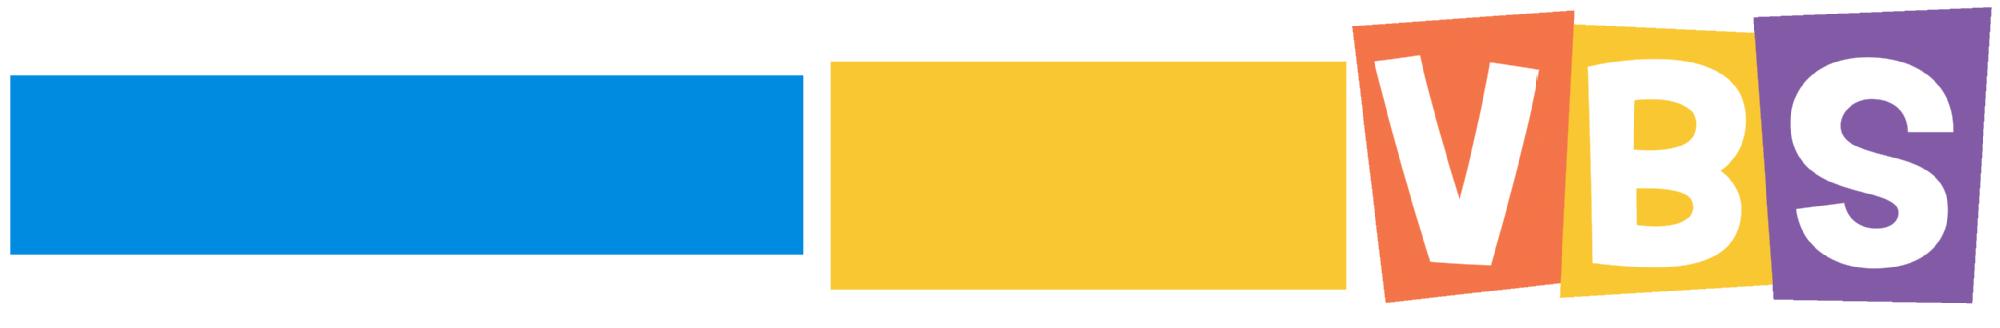 catholicbrain footer new logo